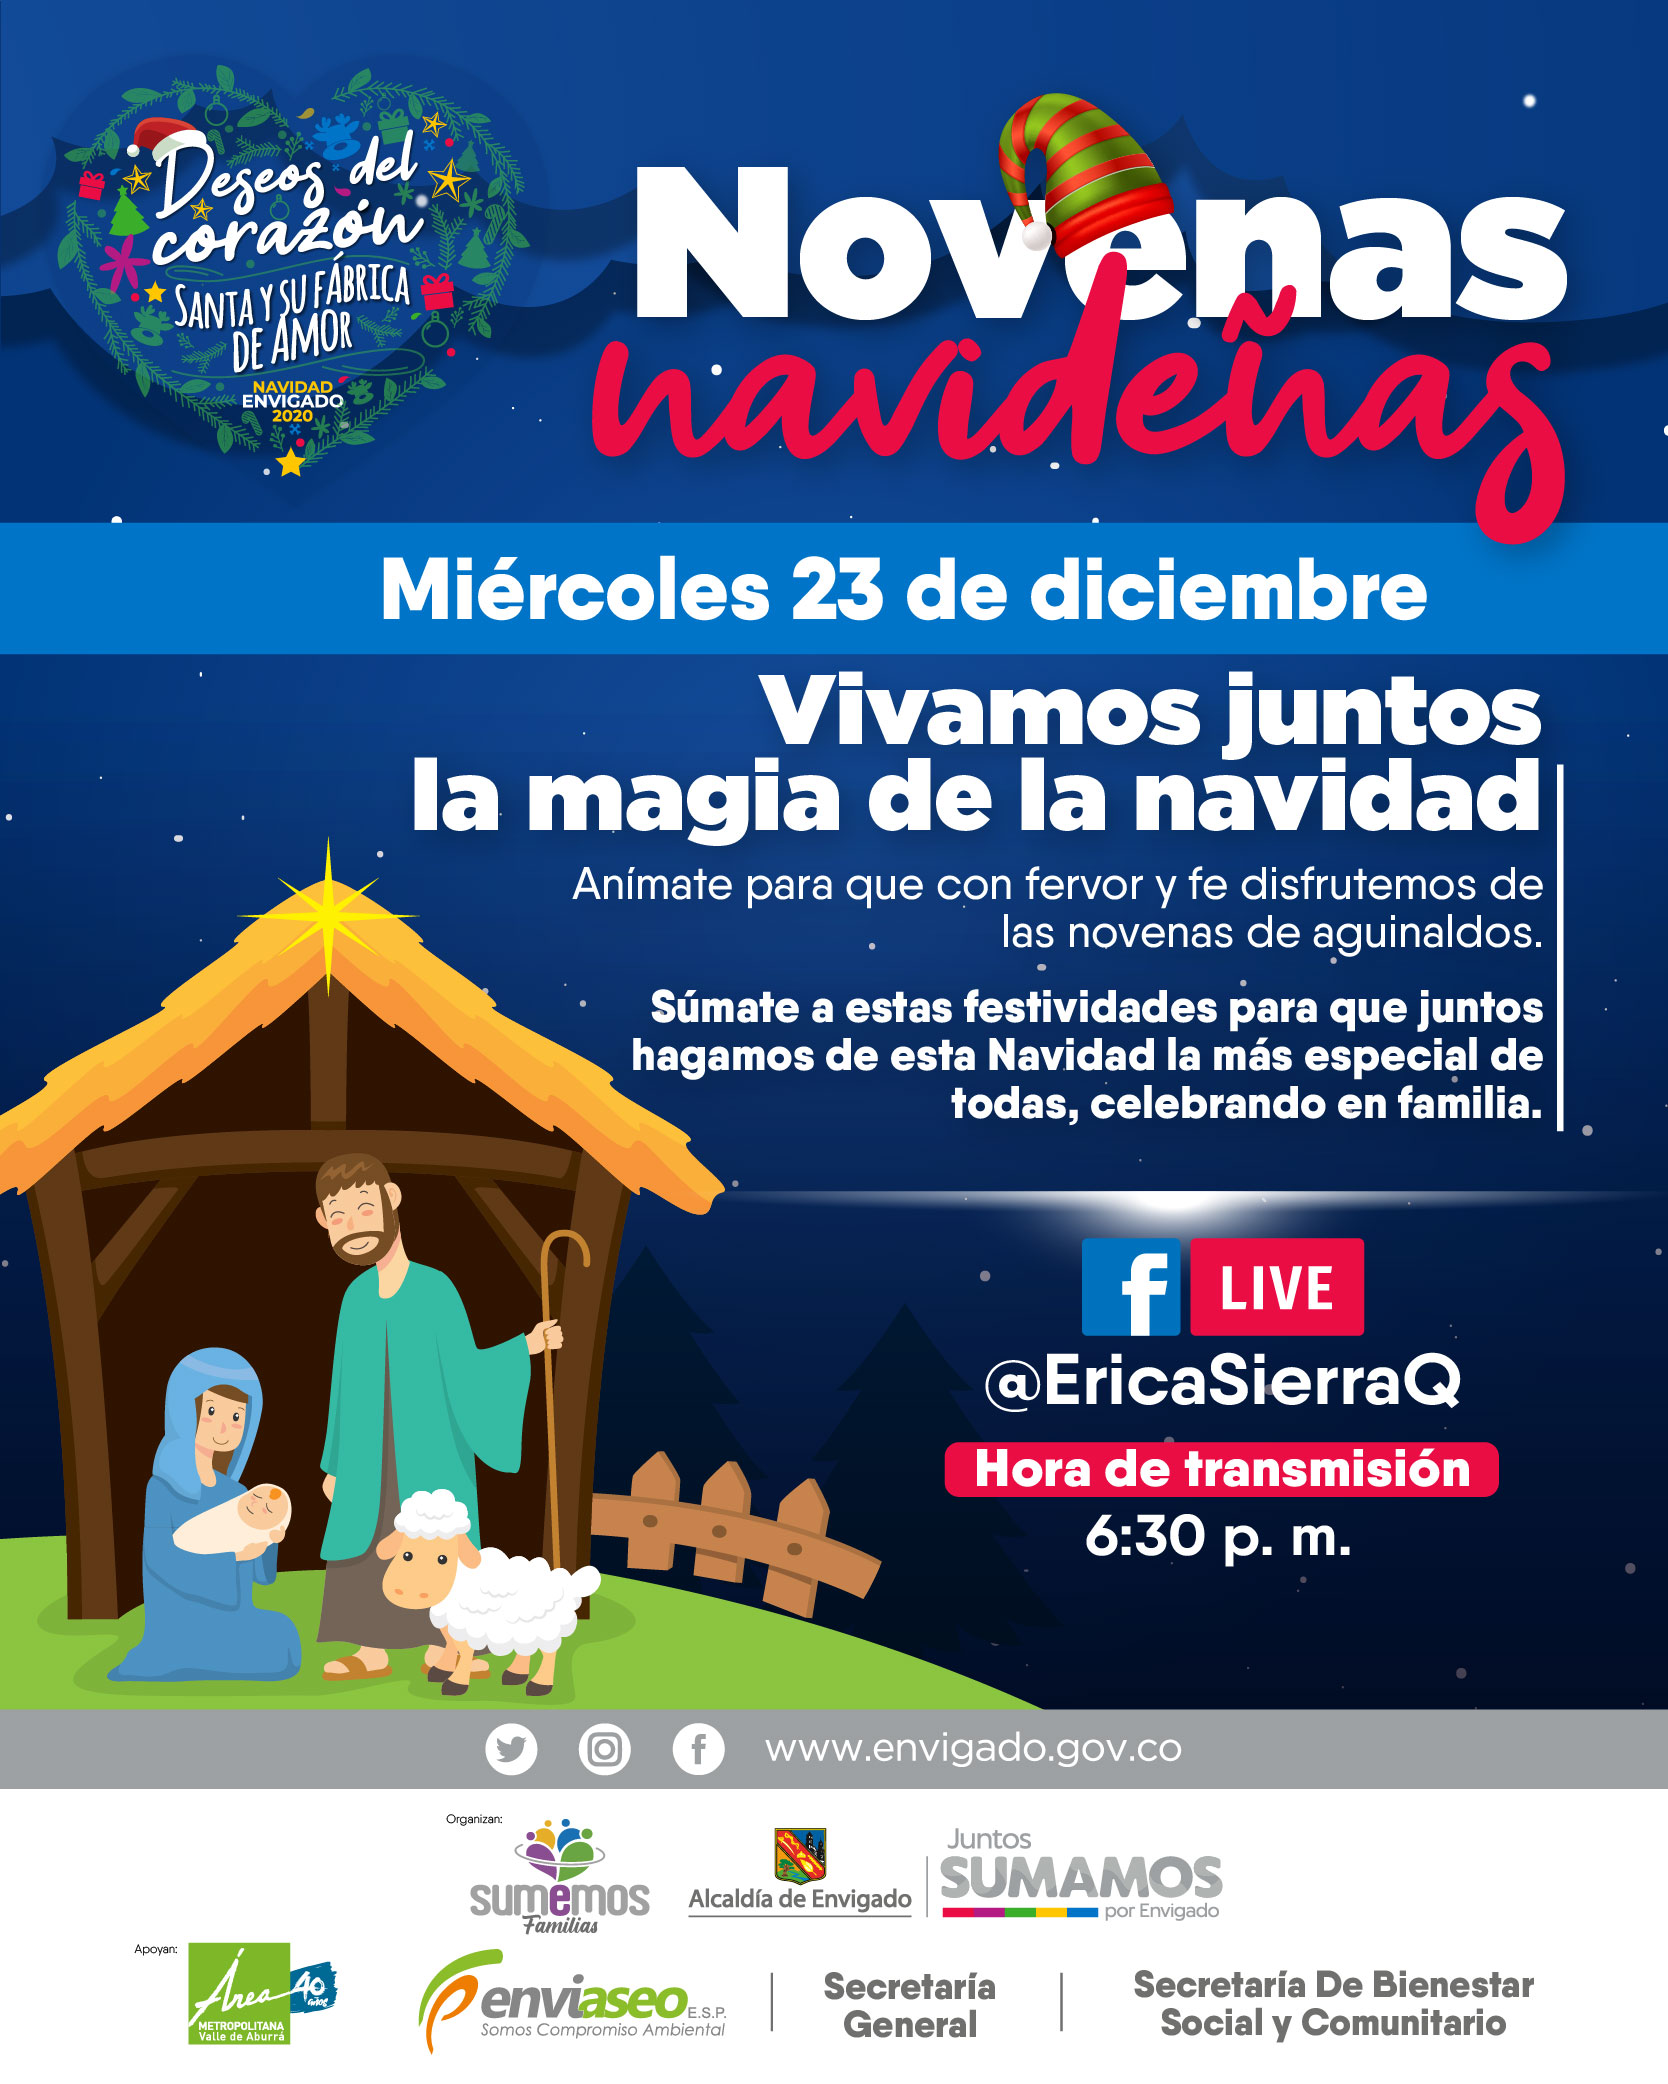 Image Diciembre 16